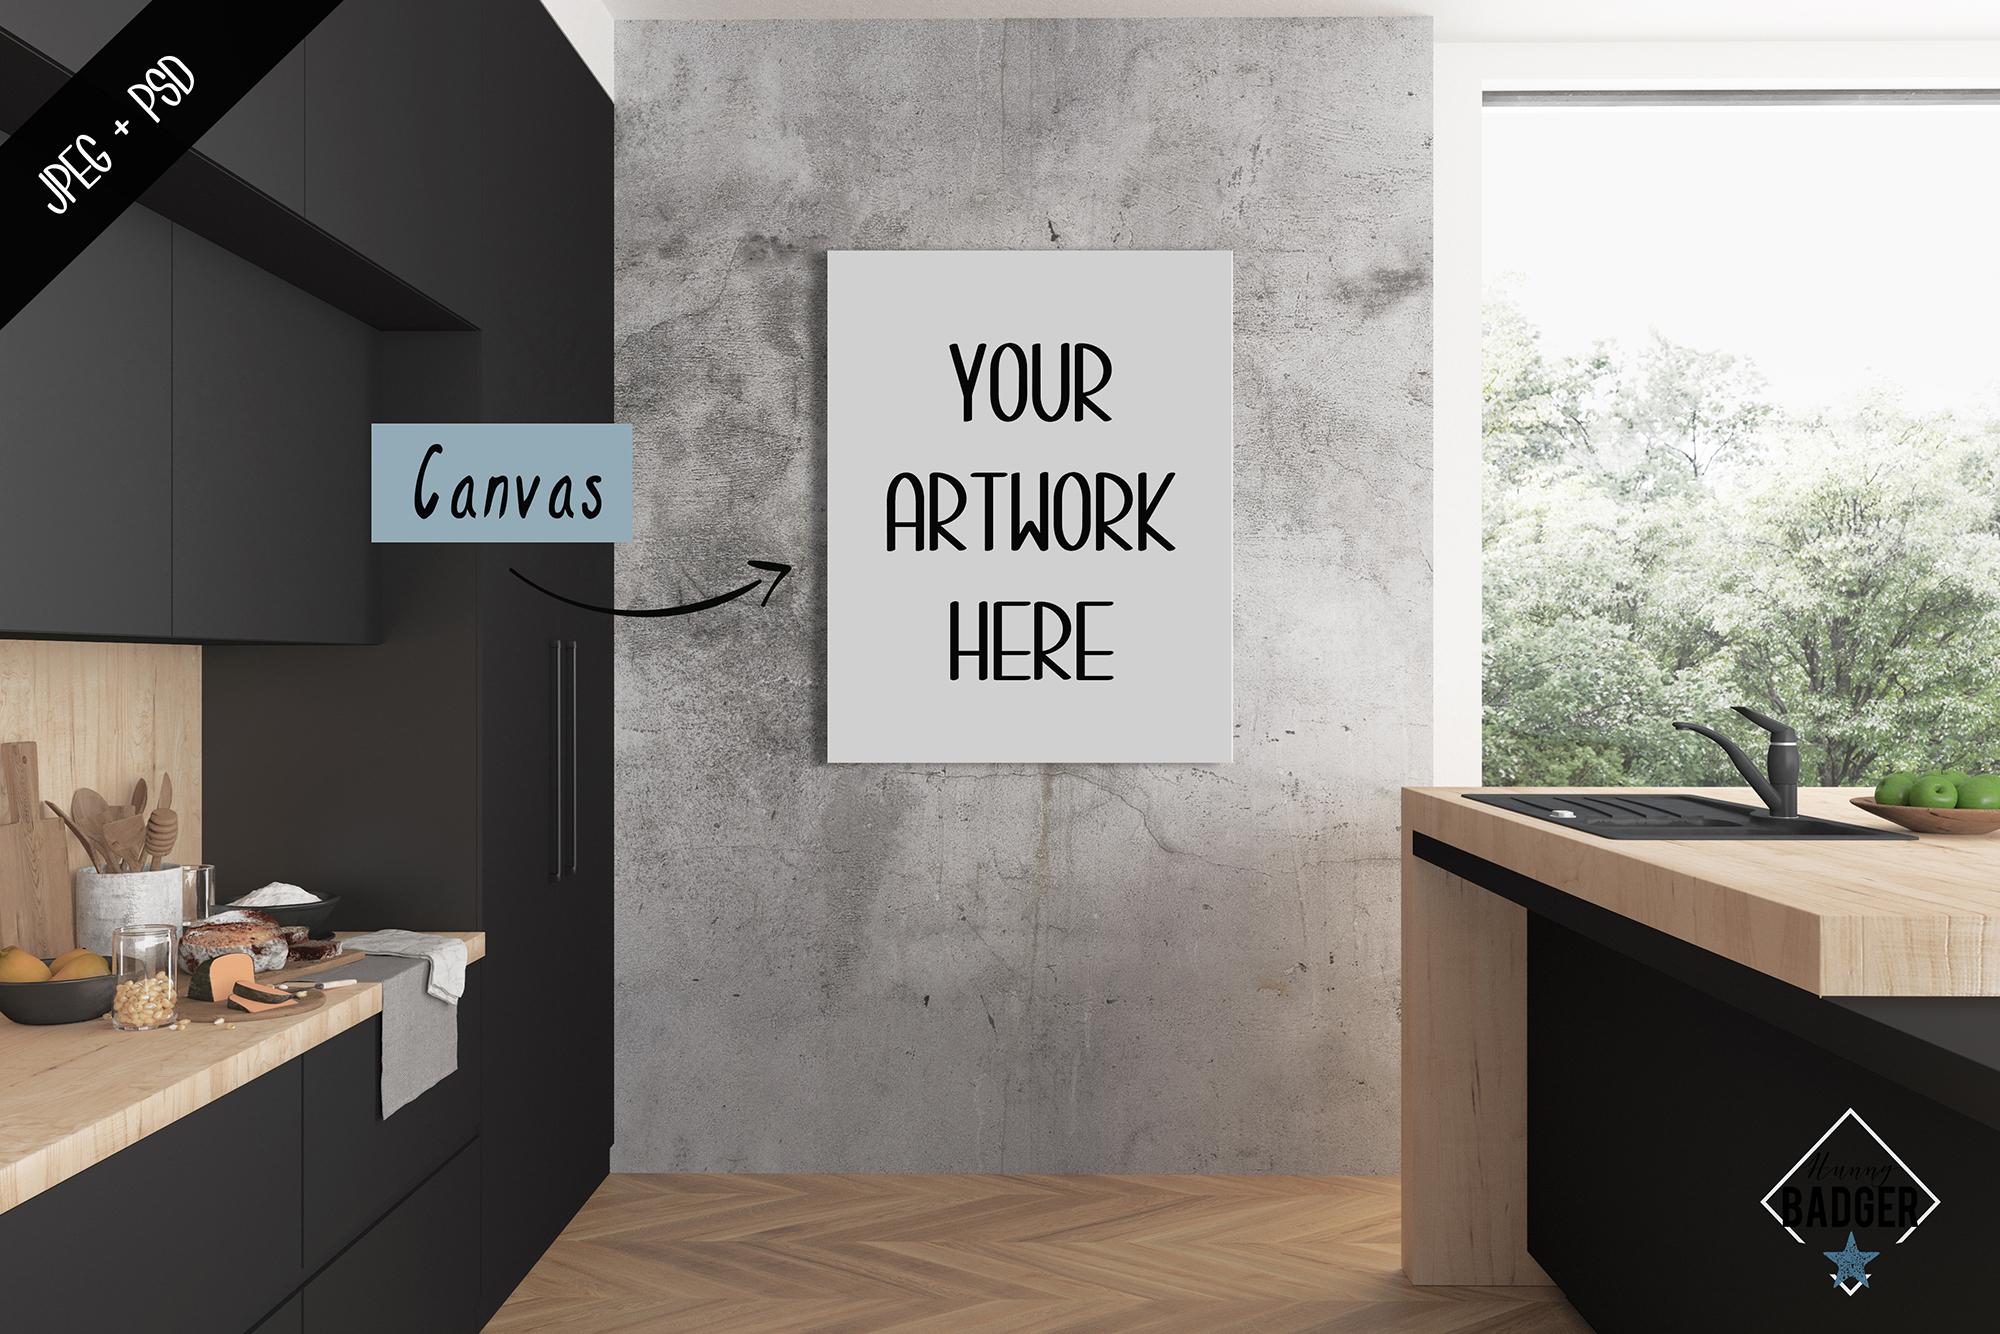 Interior mockup - frame & wall mockup creator example image 4